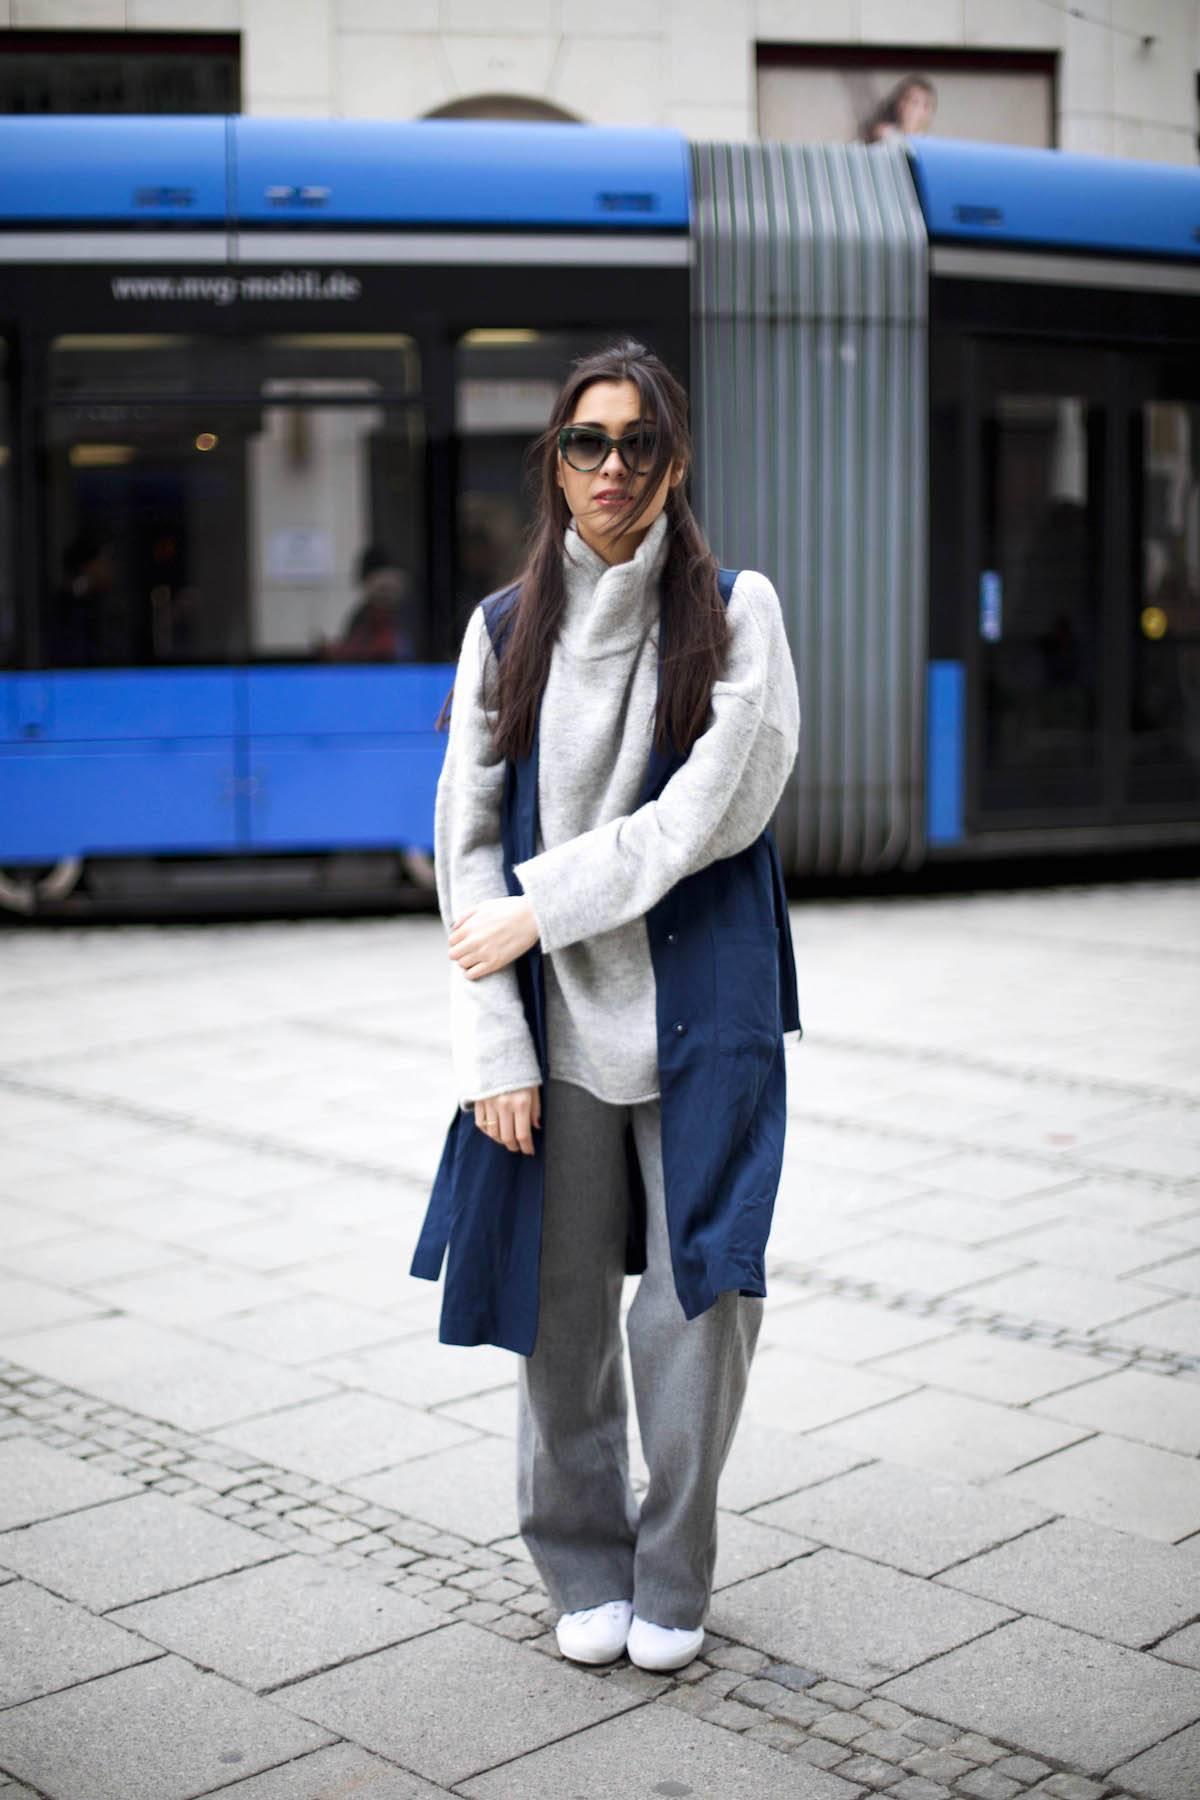 Wide Leg Pants - Palazzo - Wool - Spring - Trends 2016 - Comfy - Casual - OOTD - München - Fashionblog - German Fashionblhgger - Fashionista - Inspiration - Lookbook - Details - Streetstyle - Fashionblog 2016